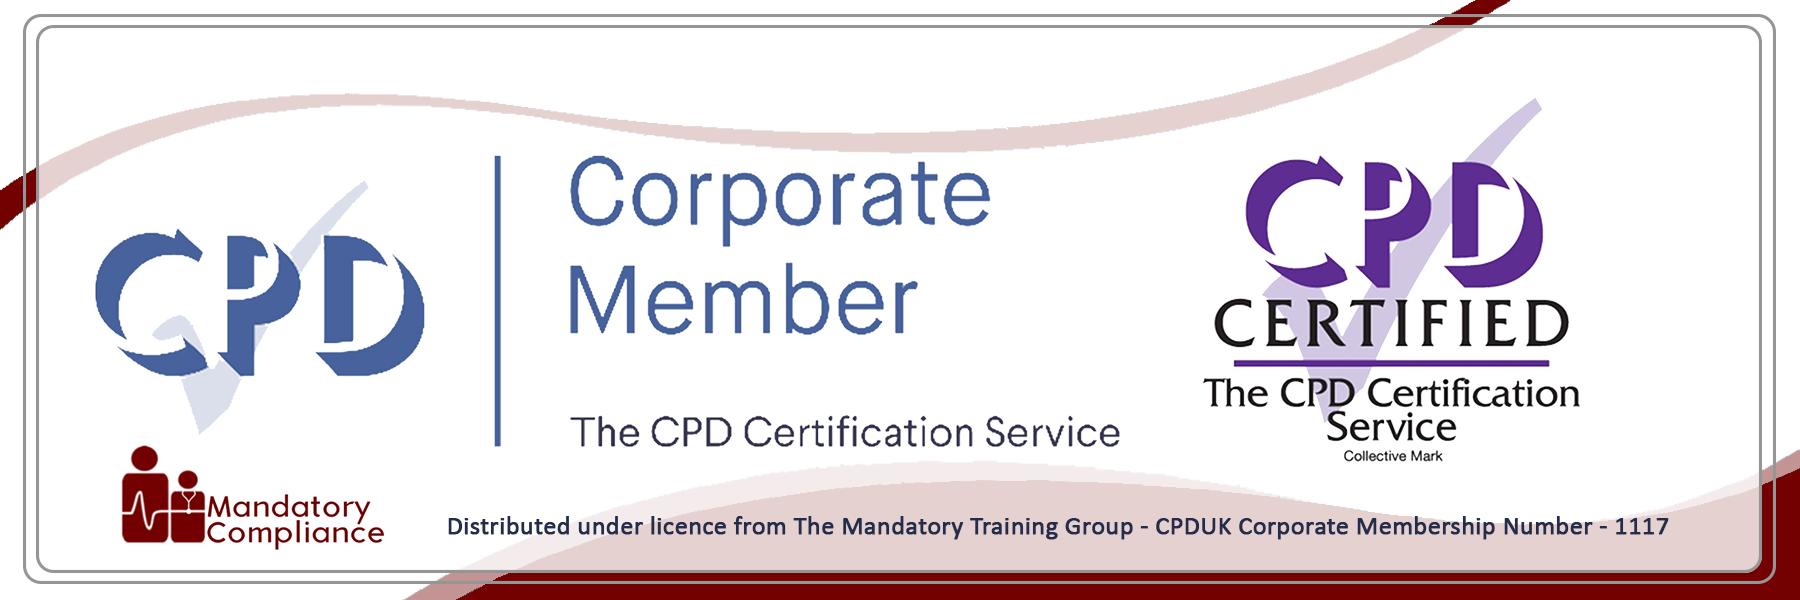 Presentation Skills Training - Intermediate Level - E-Learning Courses - Mandatory Compliance UK -